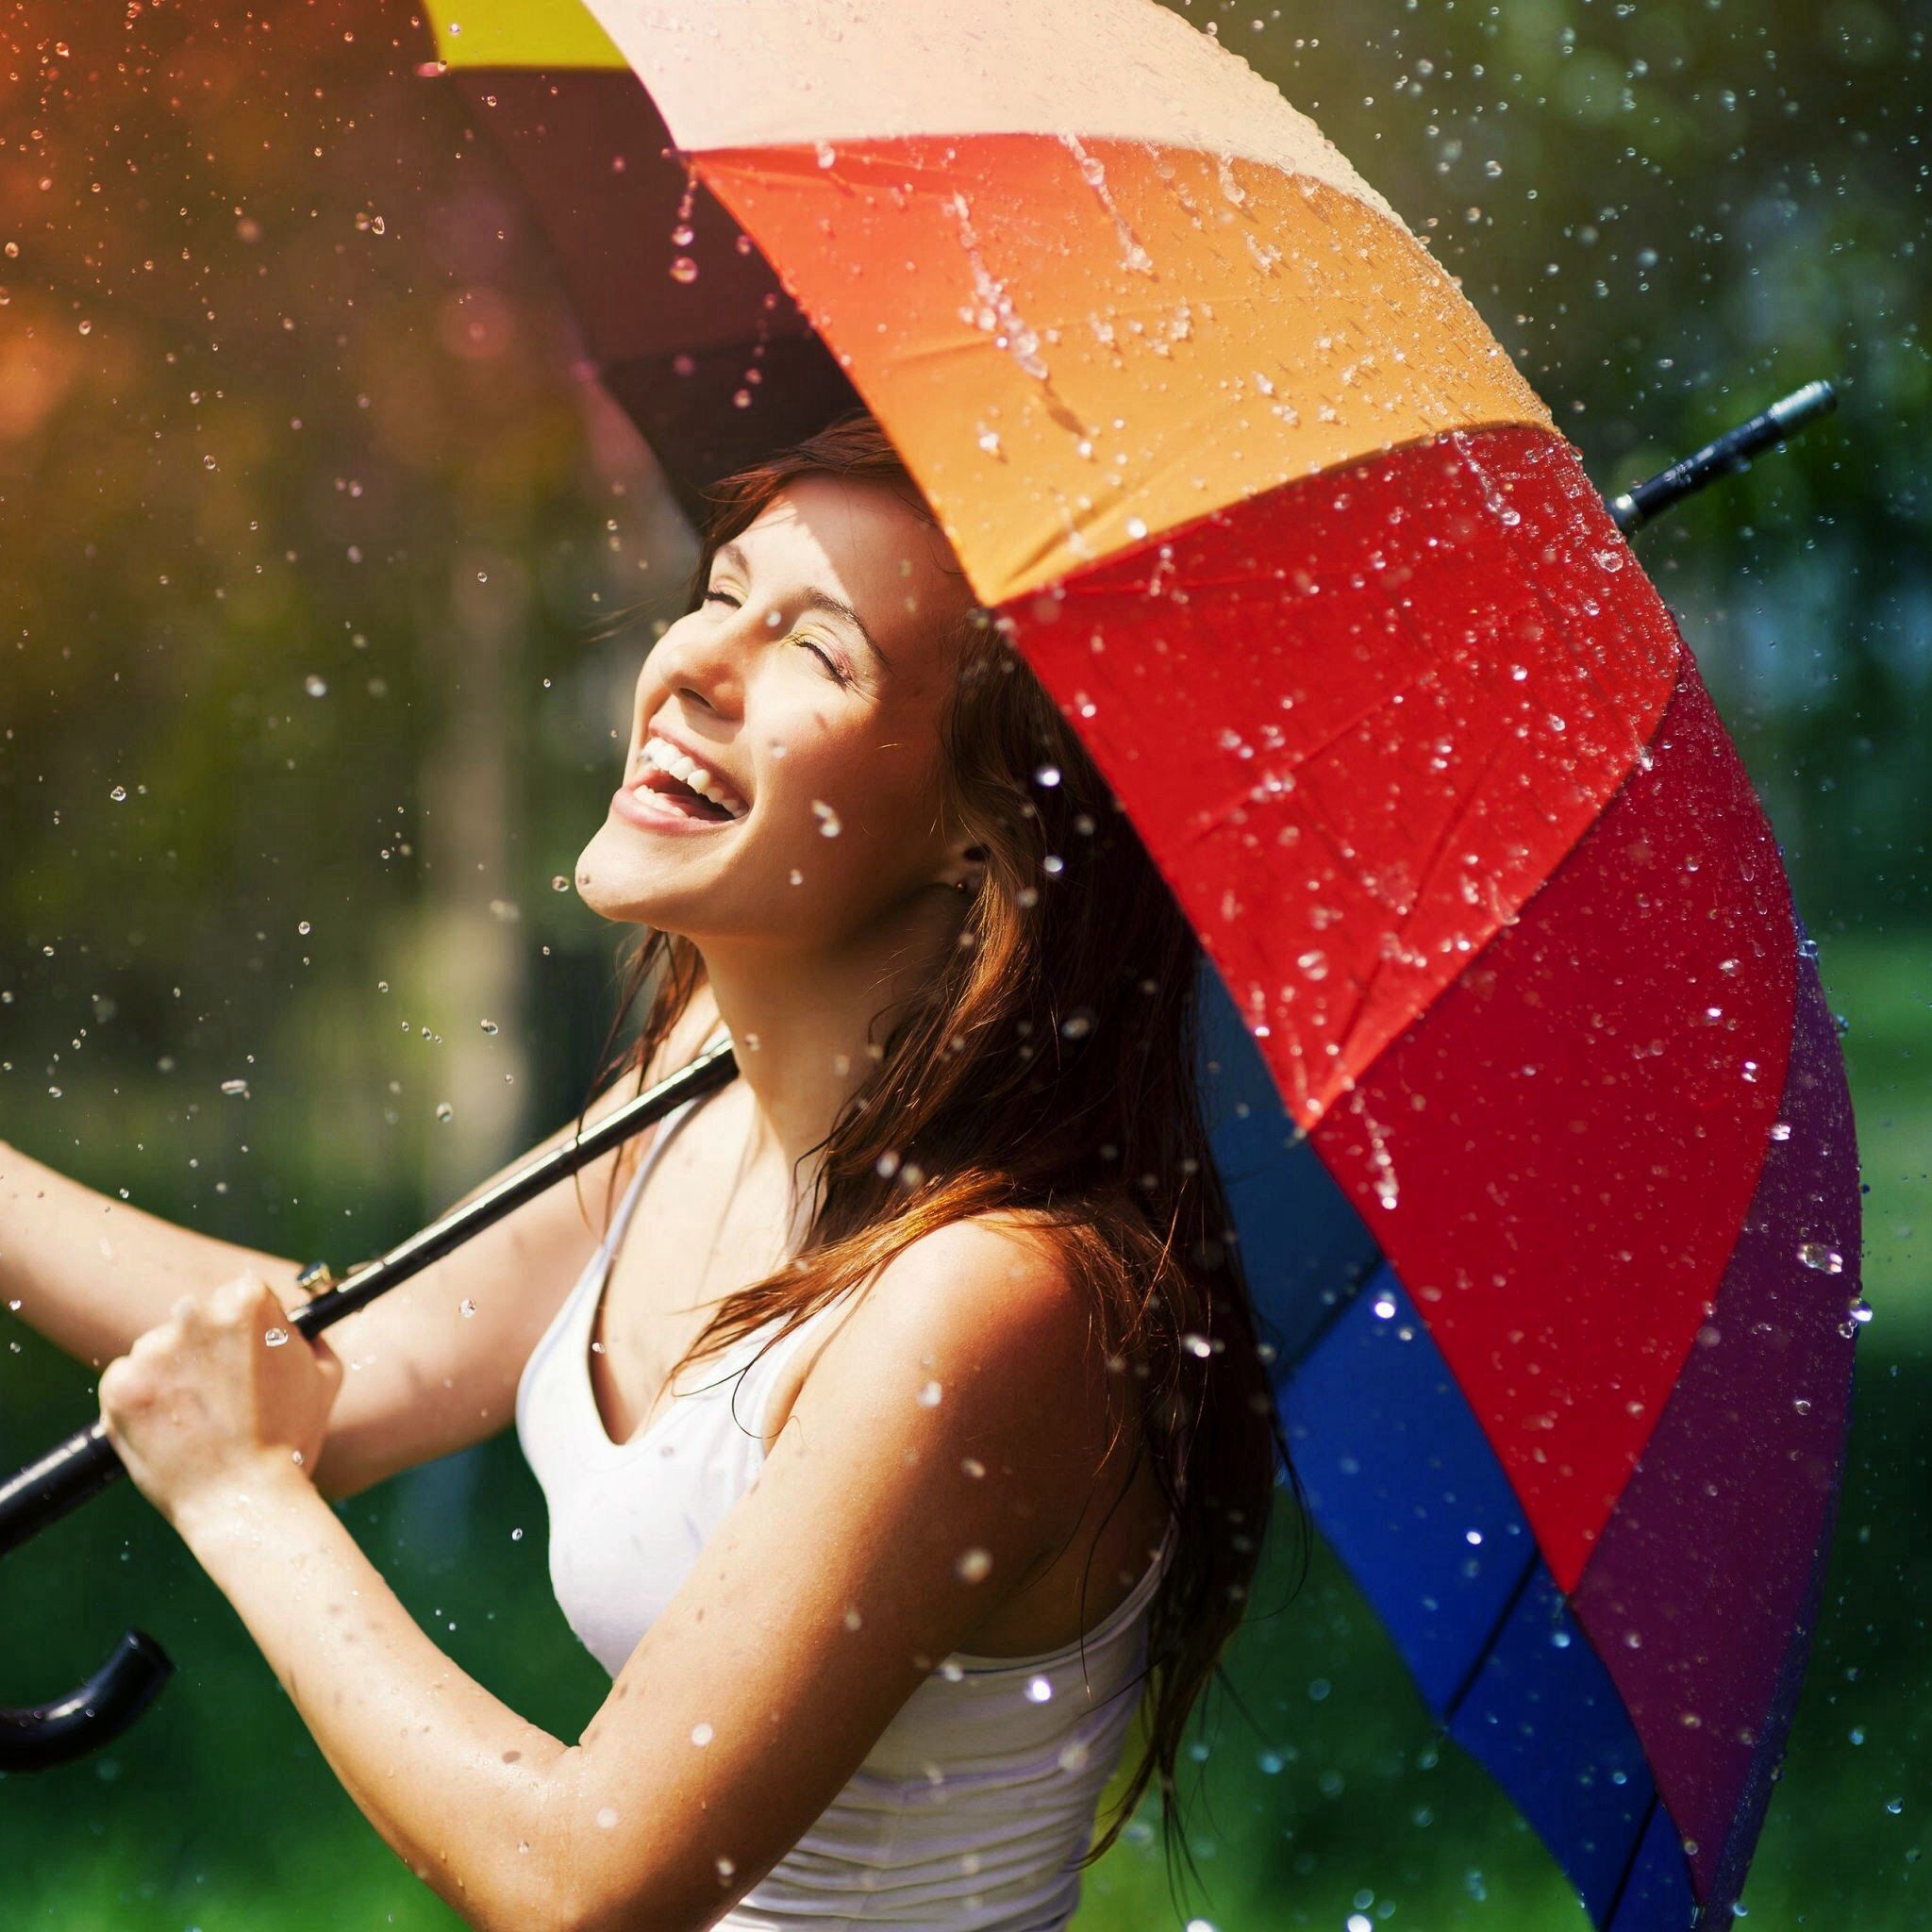 Rain umbrella drops falling photography girl